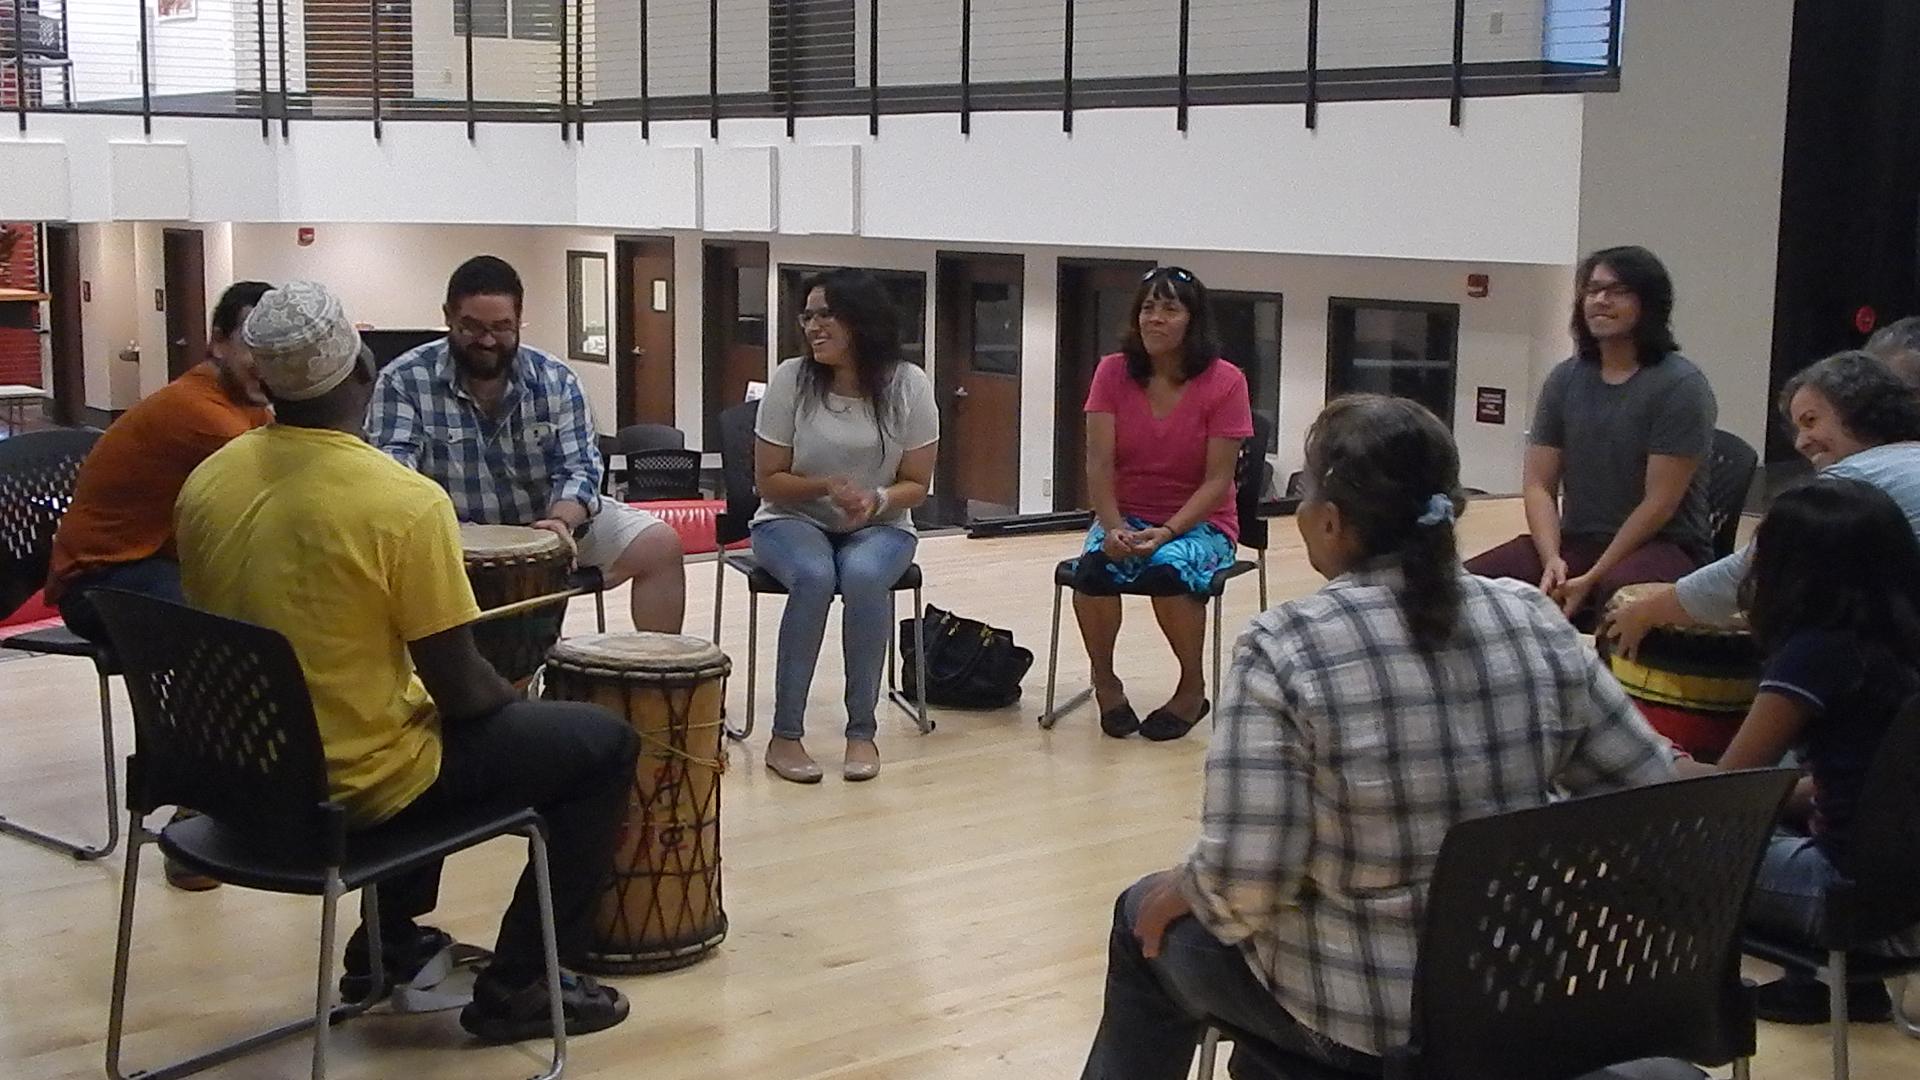 African Drum & Dance Class On Break Until December